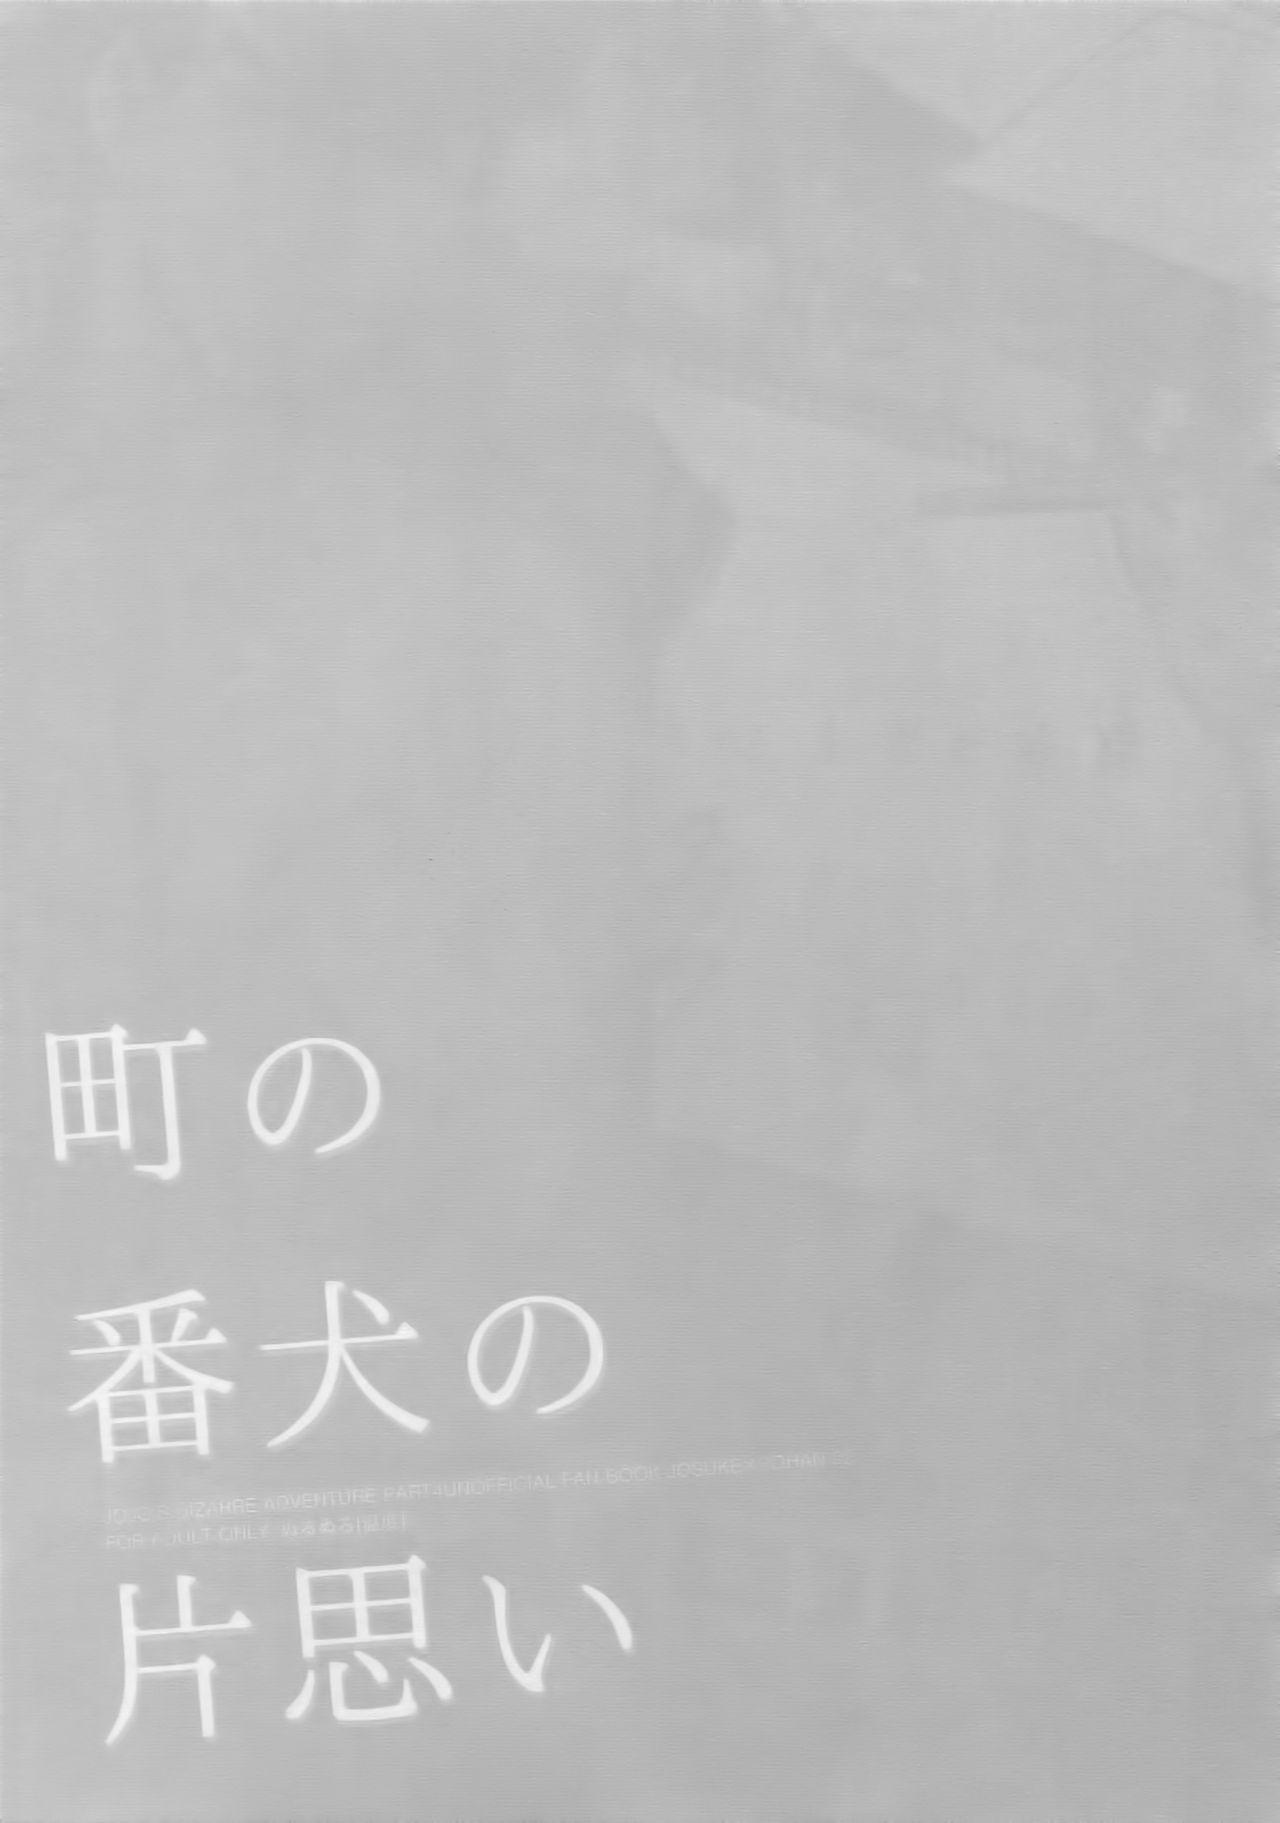 NuruNuru JoRo Sairokubon 65